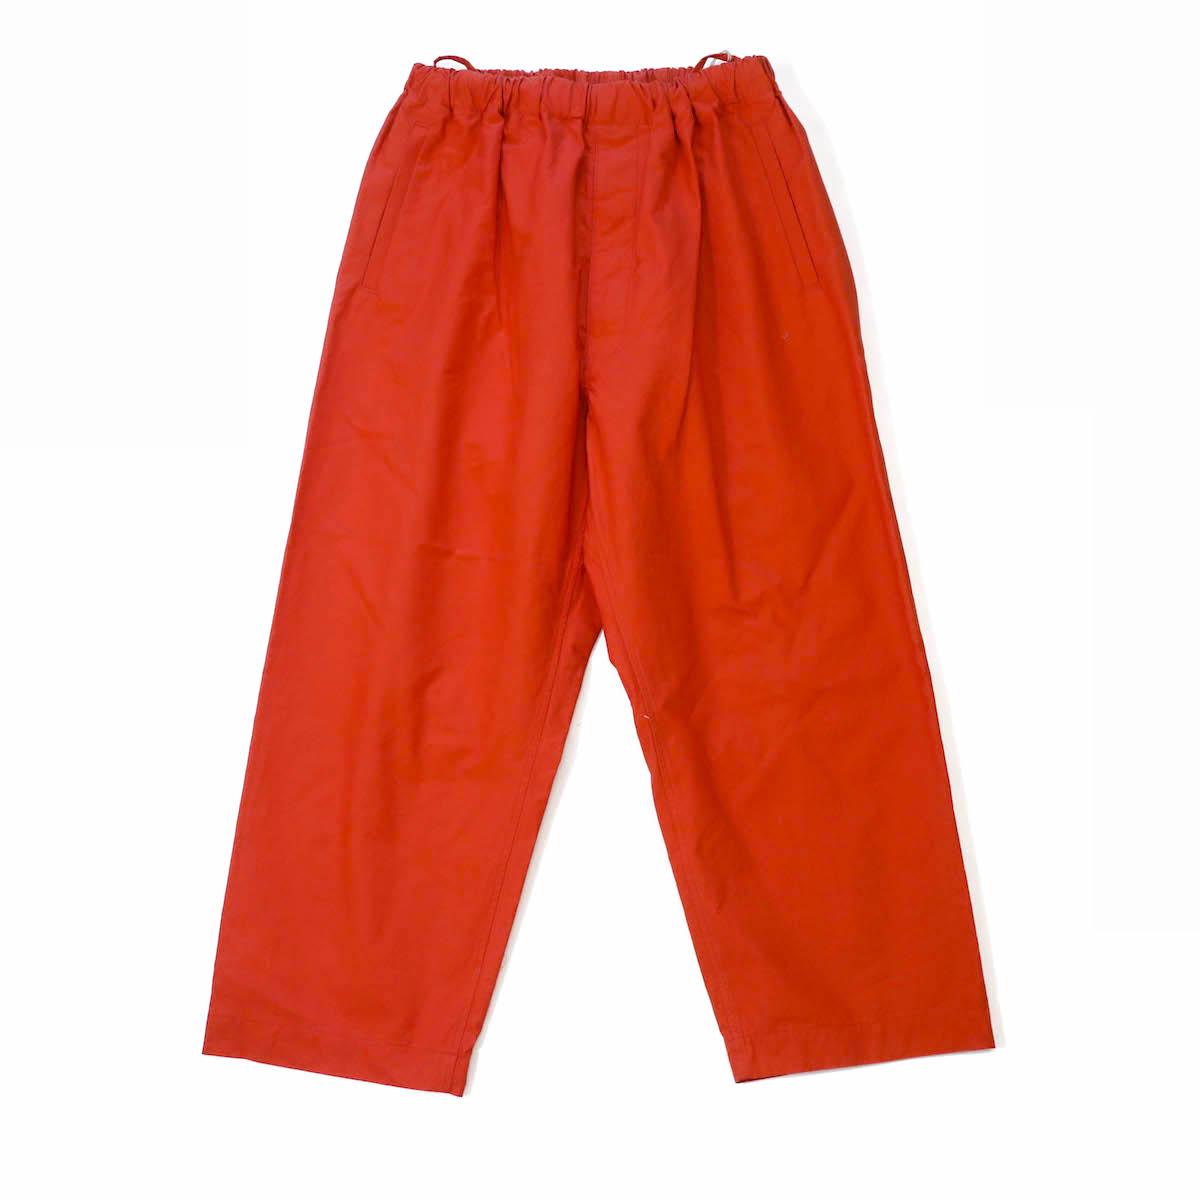 Kaptain Sunshine / Athletic Easy Pants